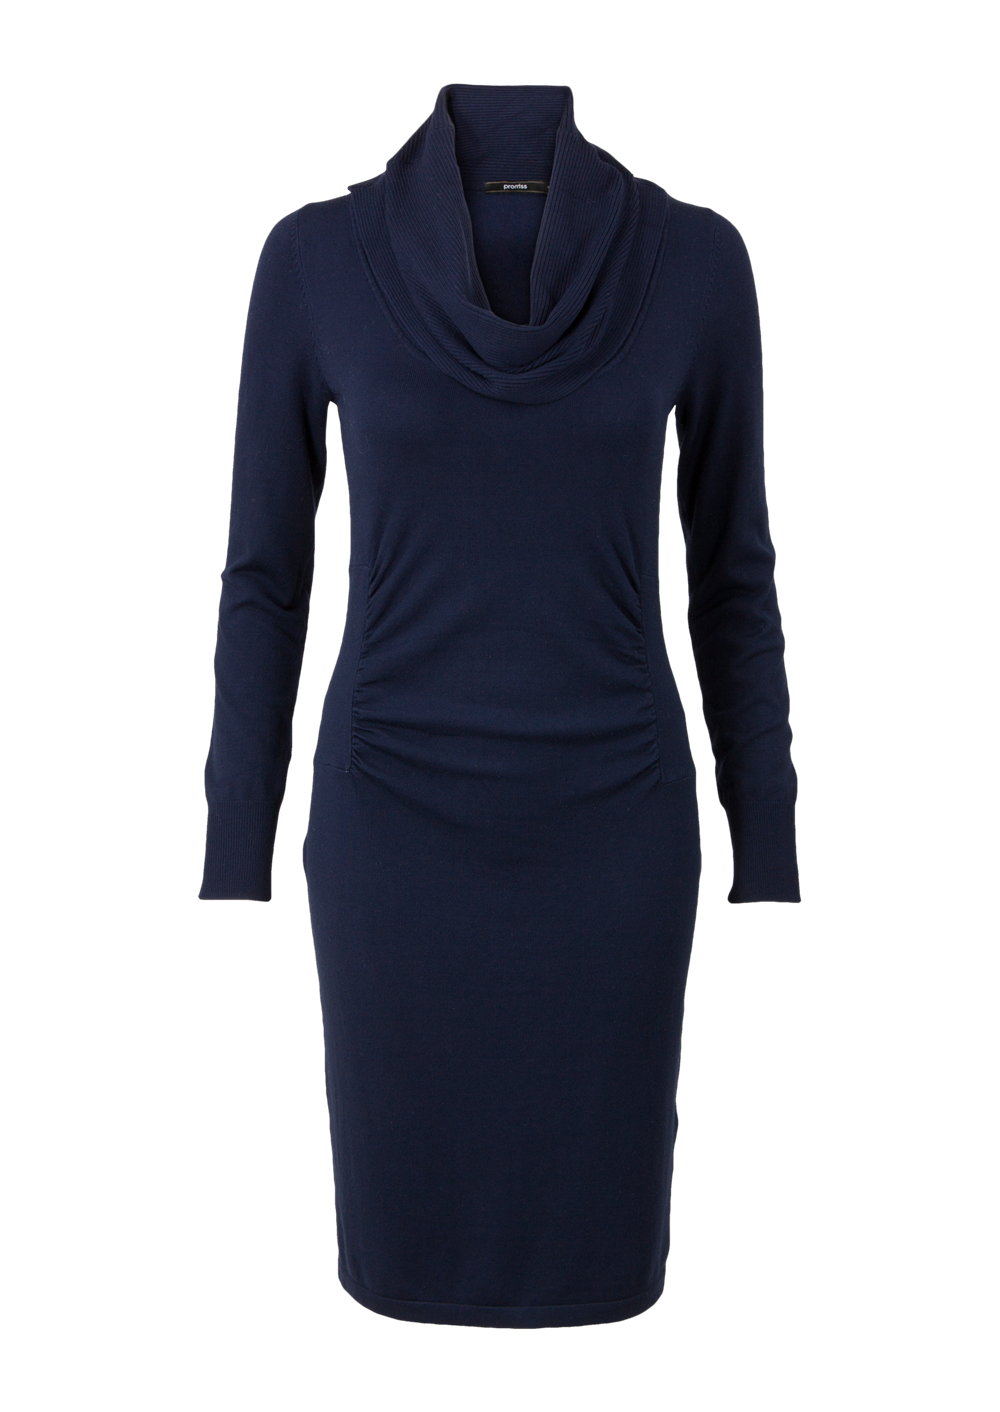 Lichtblauwe jurk met lange mouwen